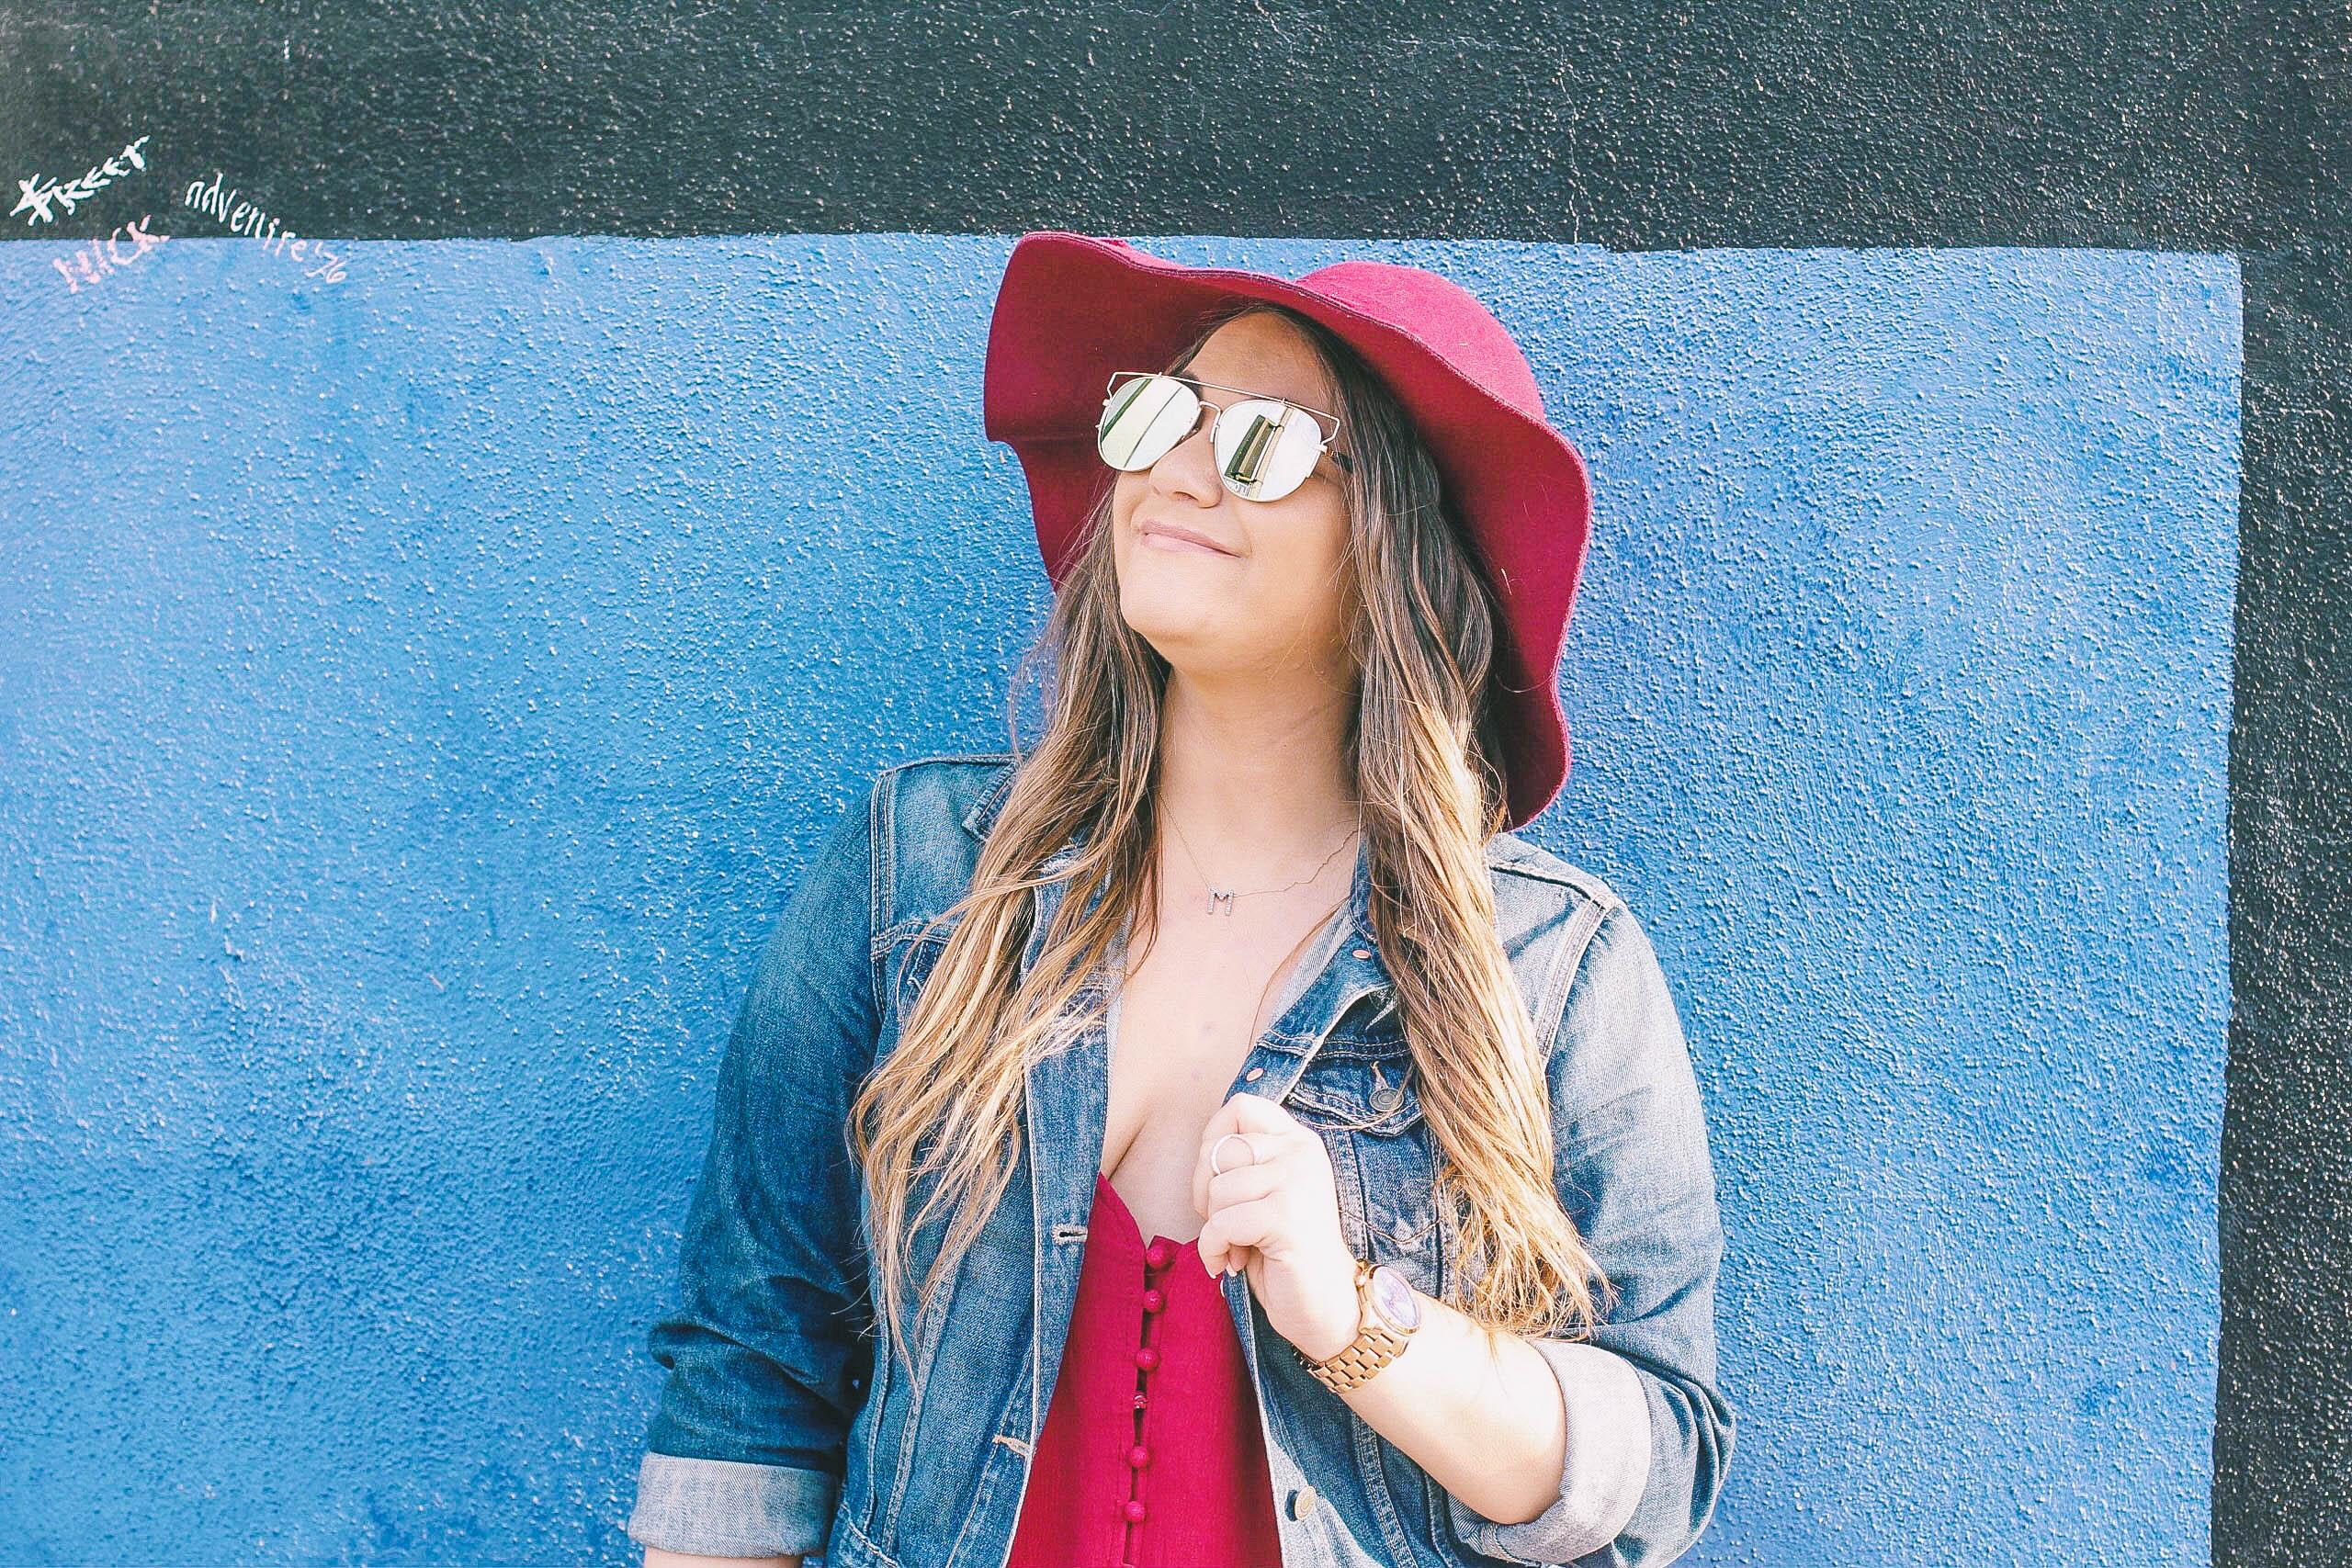 missyonmadison, ily mix, metal sunglasses, mirrored sunnies, mirrored sunglasses, metal mirrored sunglasses, metal framed sunglasses, sunglasses, dior sunglasses, ray bans, mirrored sunnies, la blogger, fashion blogger, sunglasses shopping guide,